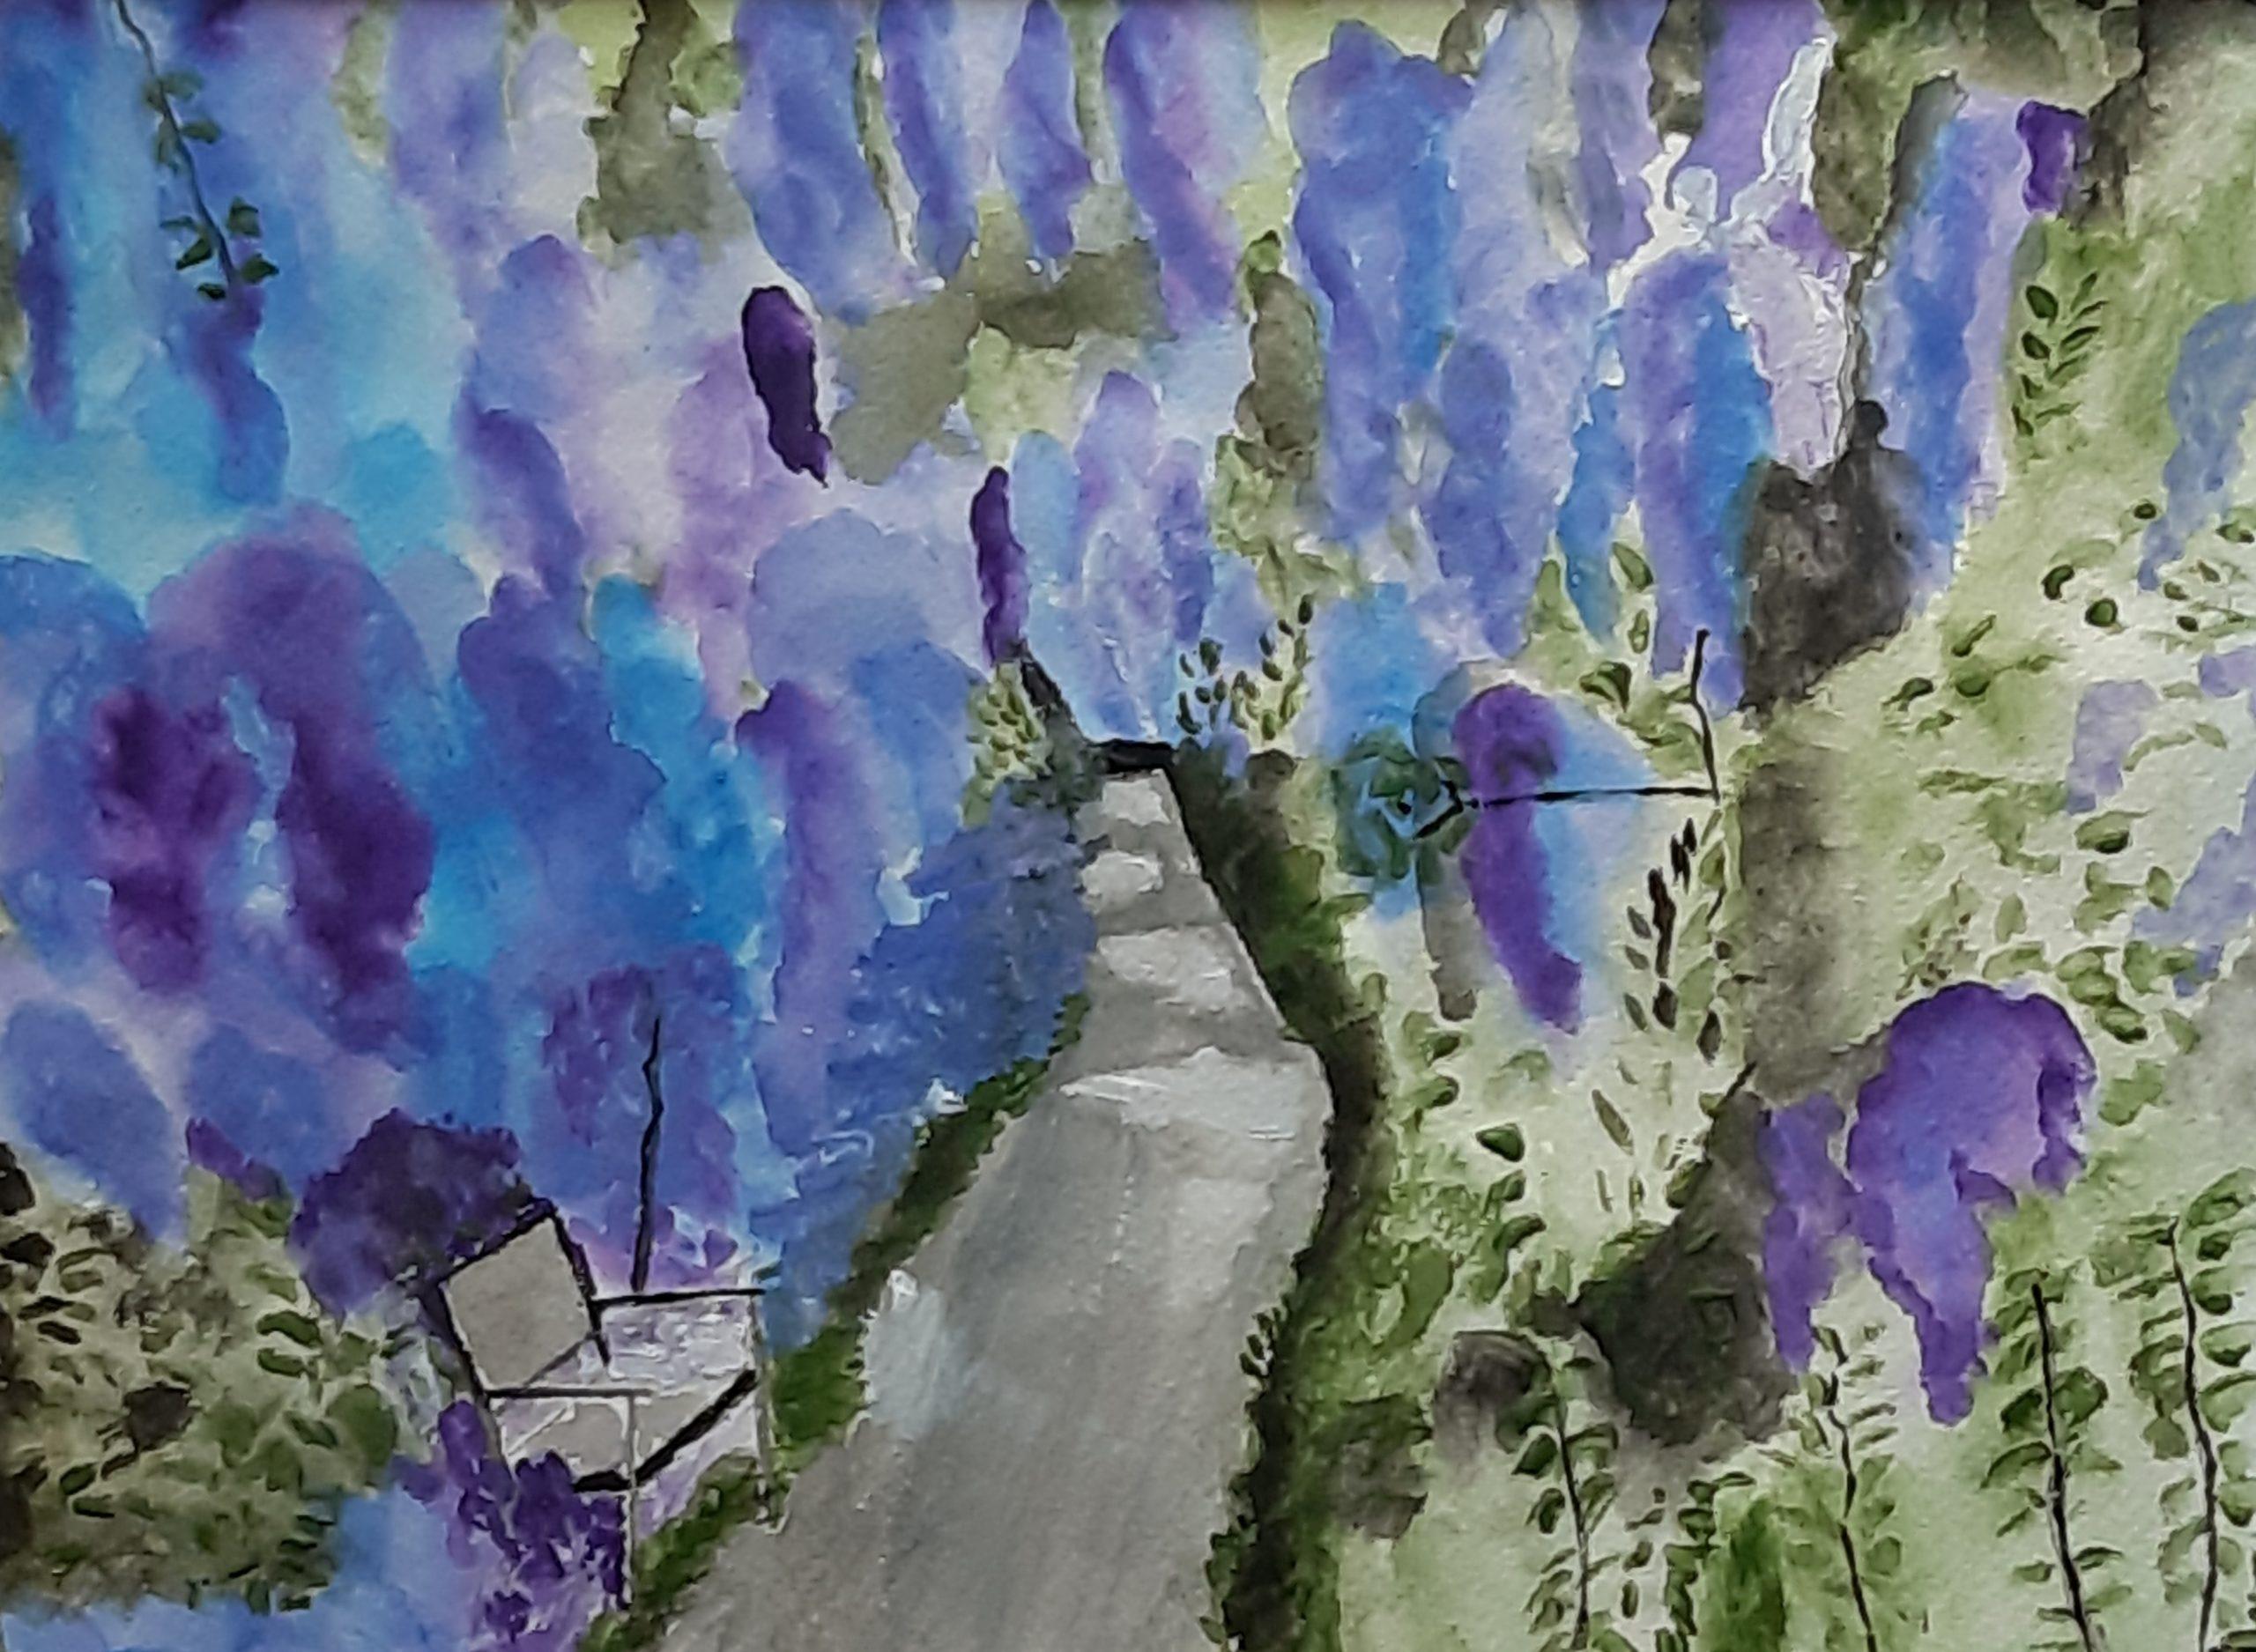 il giardino acquerello su cartoncino 24 x 32 cm 2019